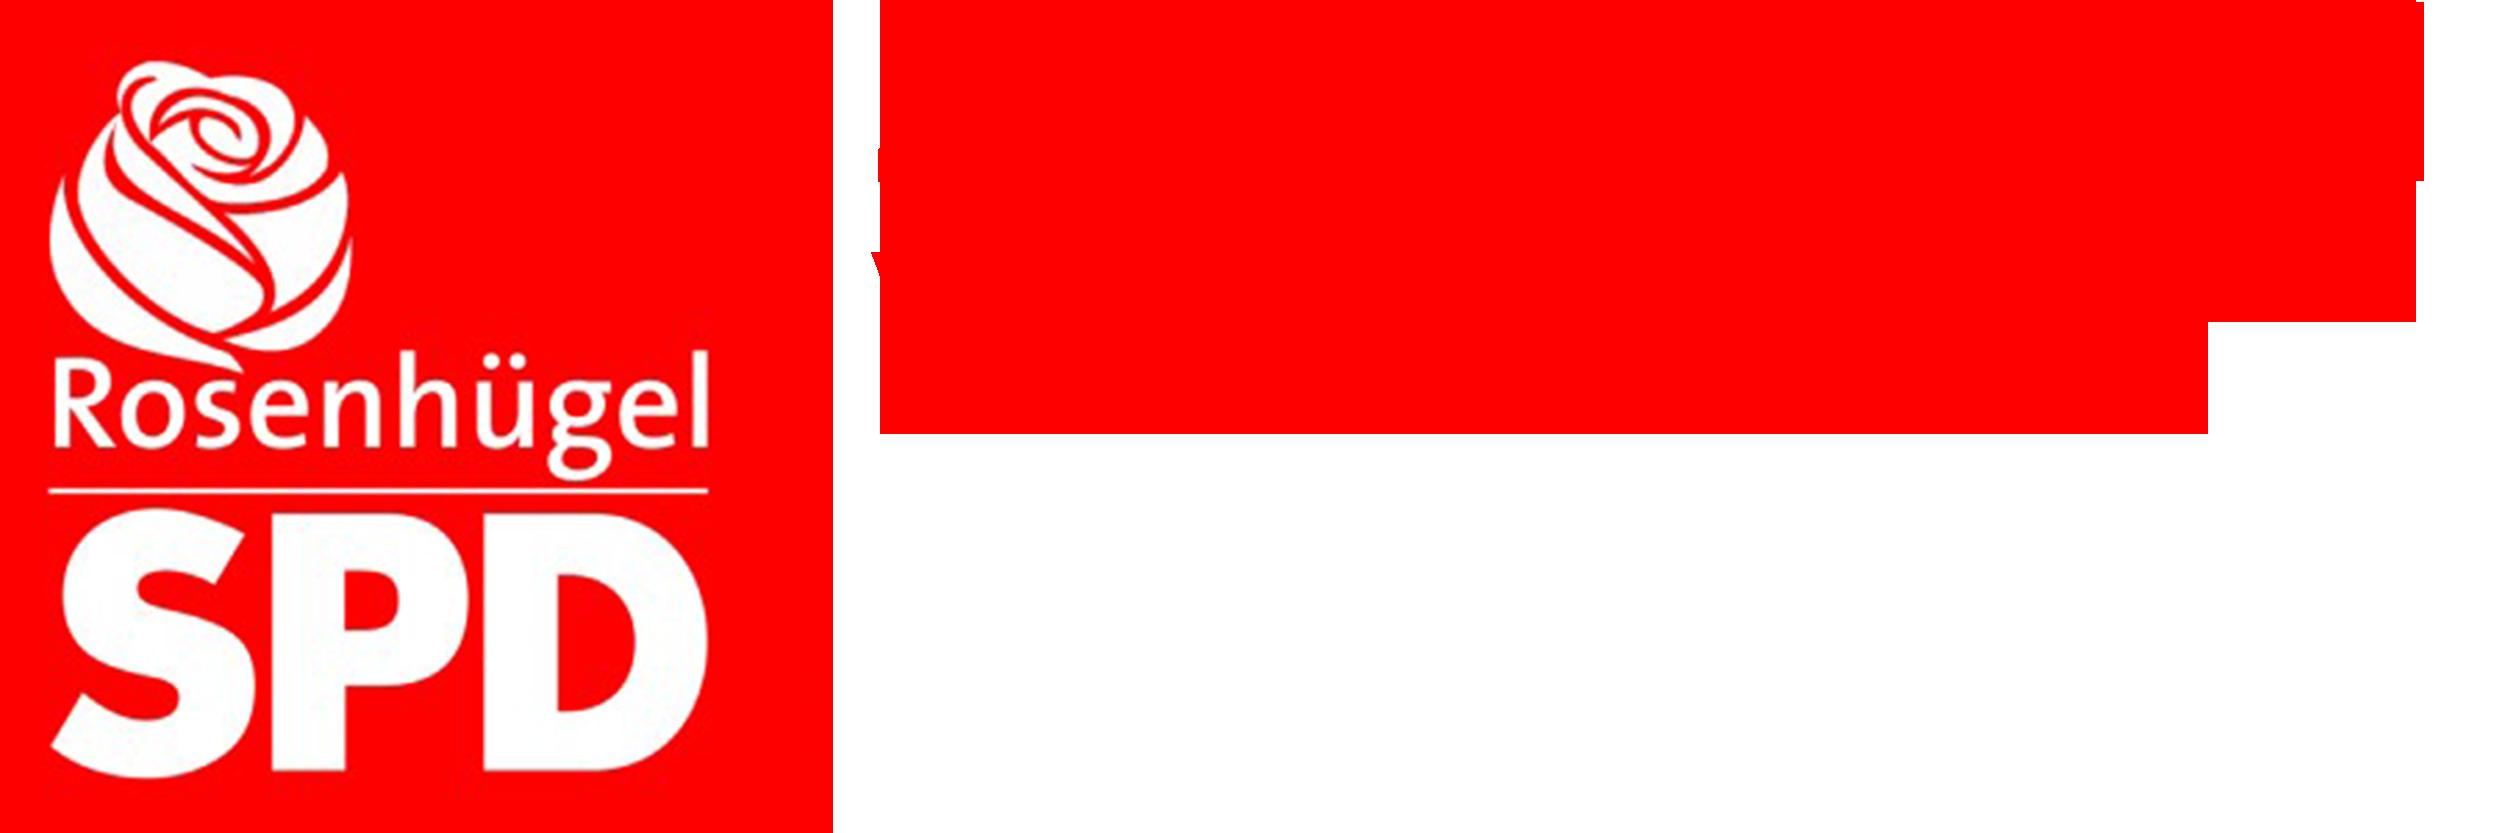 SPD Rosenhügel